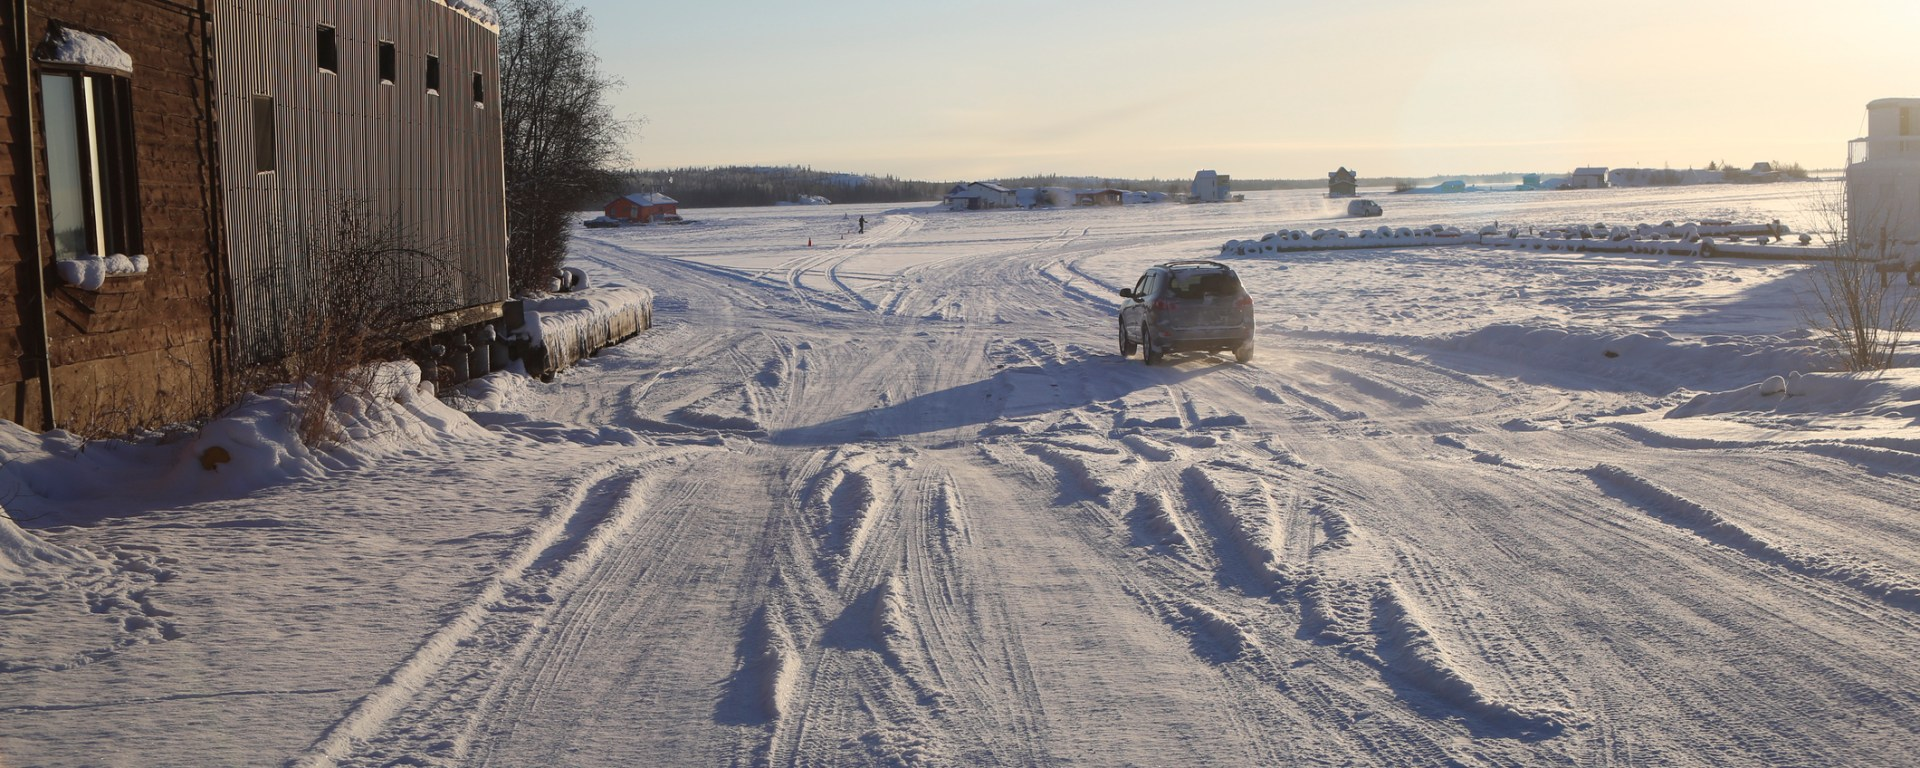 Van on Yellowknife Ice Road, Northwest Territories, Canada